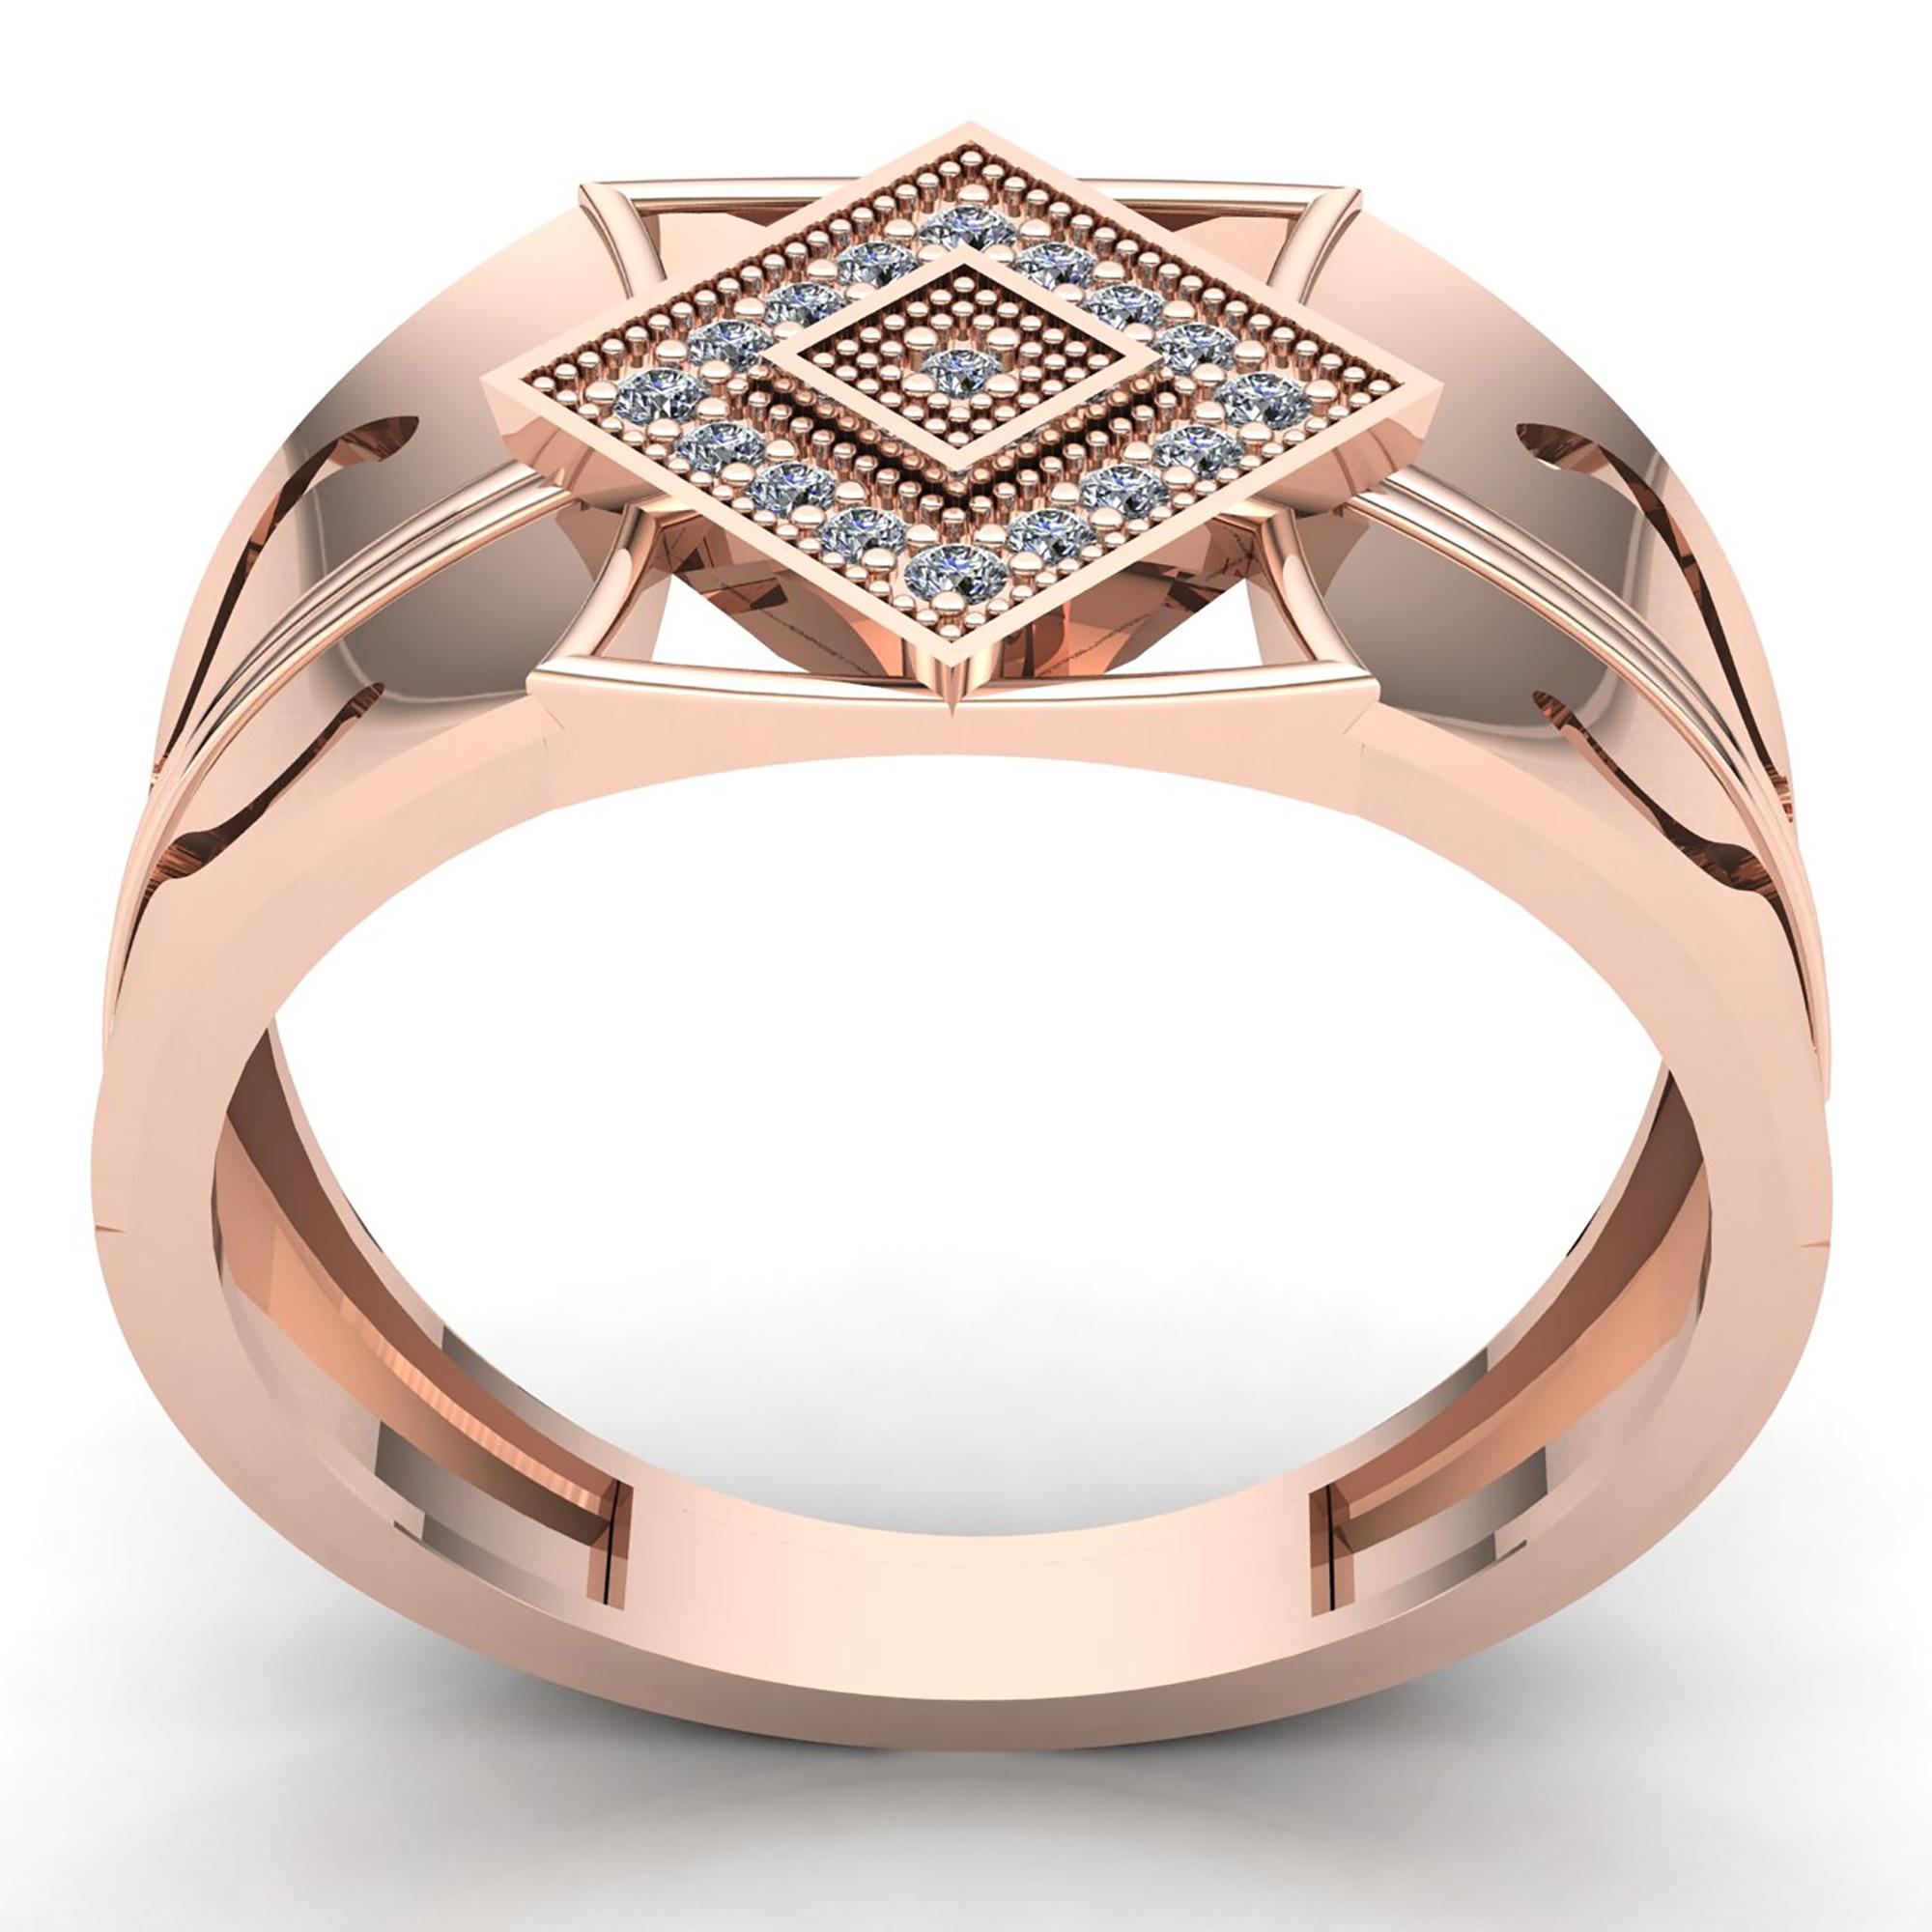 0.33carat Round Cut Diamond Mens For Him Modern Engagement ...